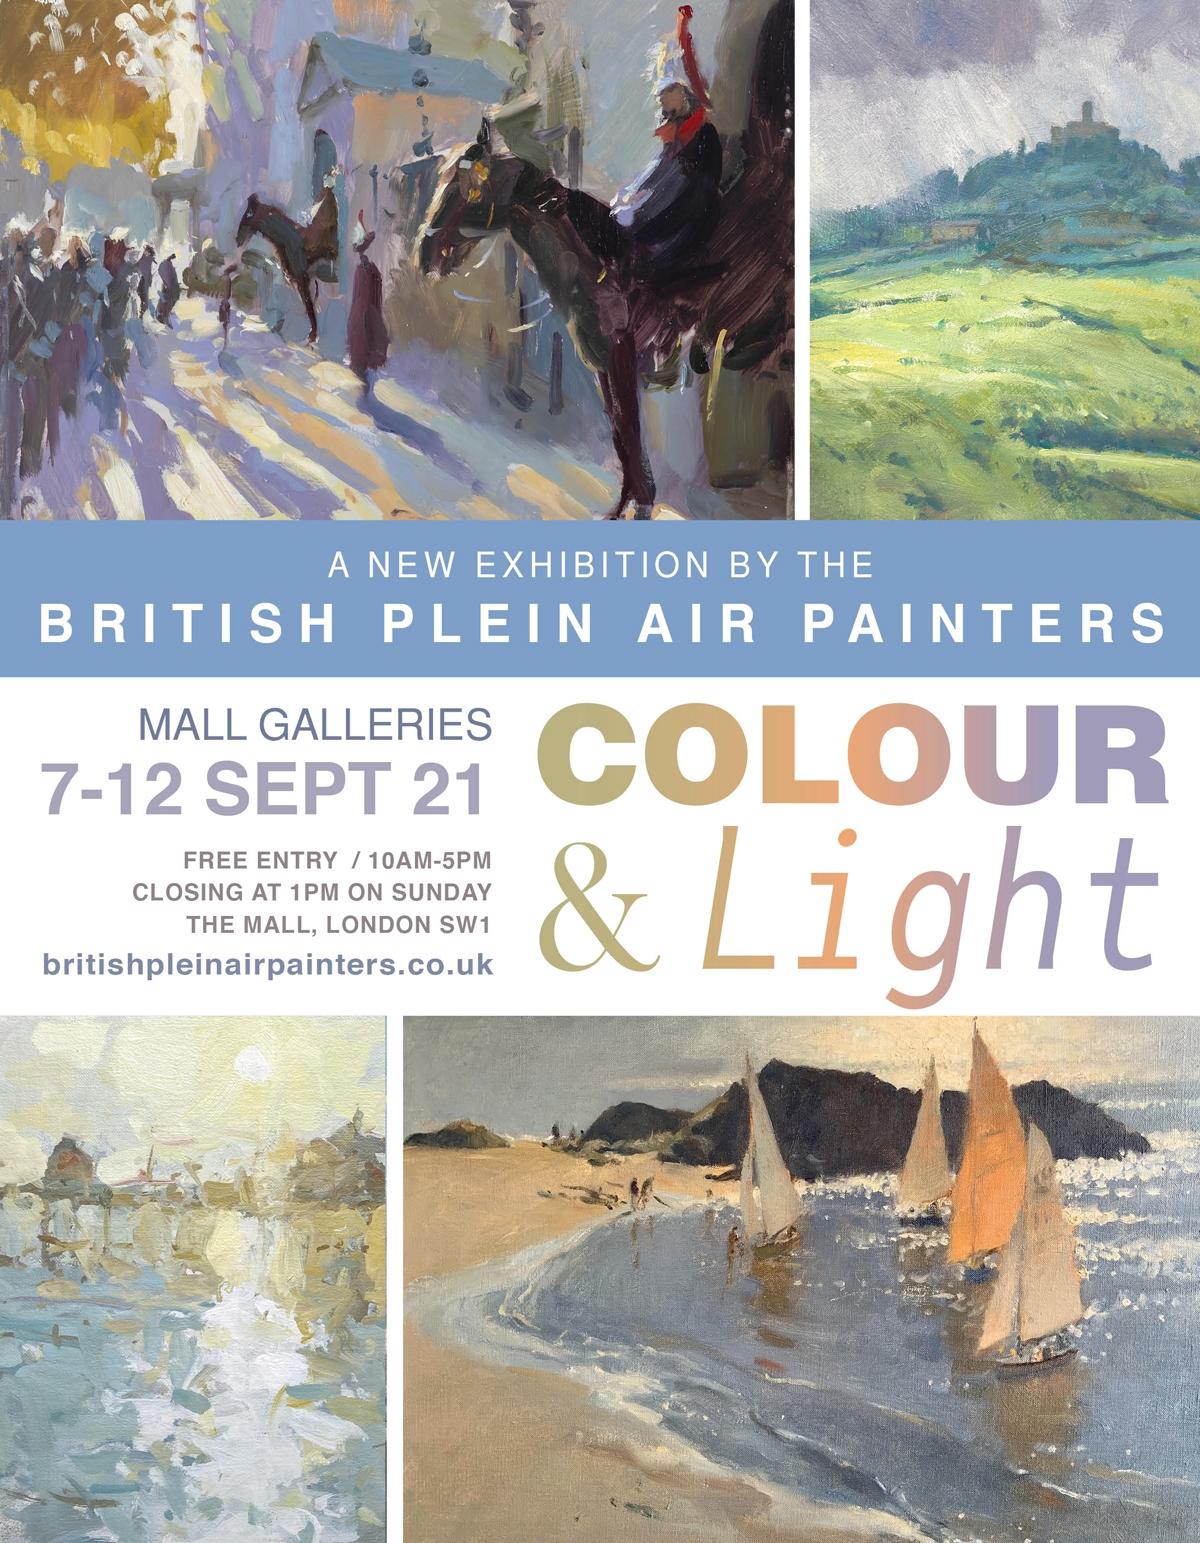 Colour and Light - British Plein Air Painters